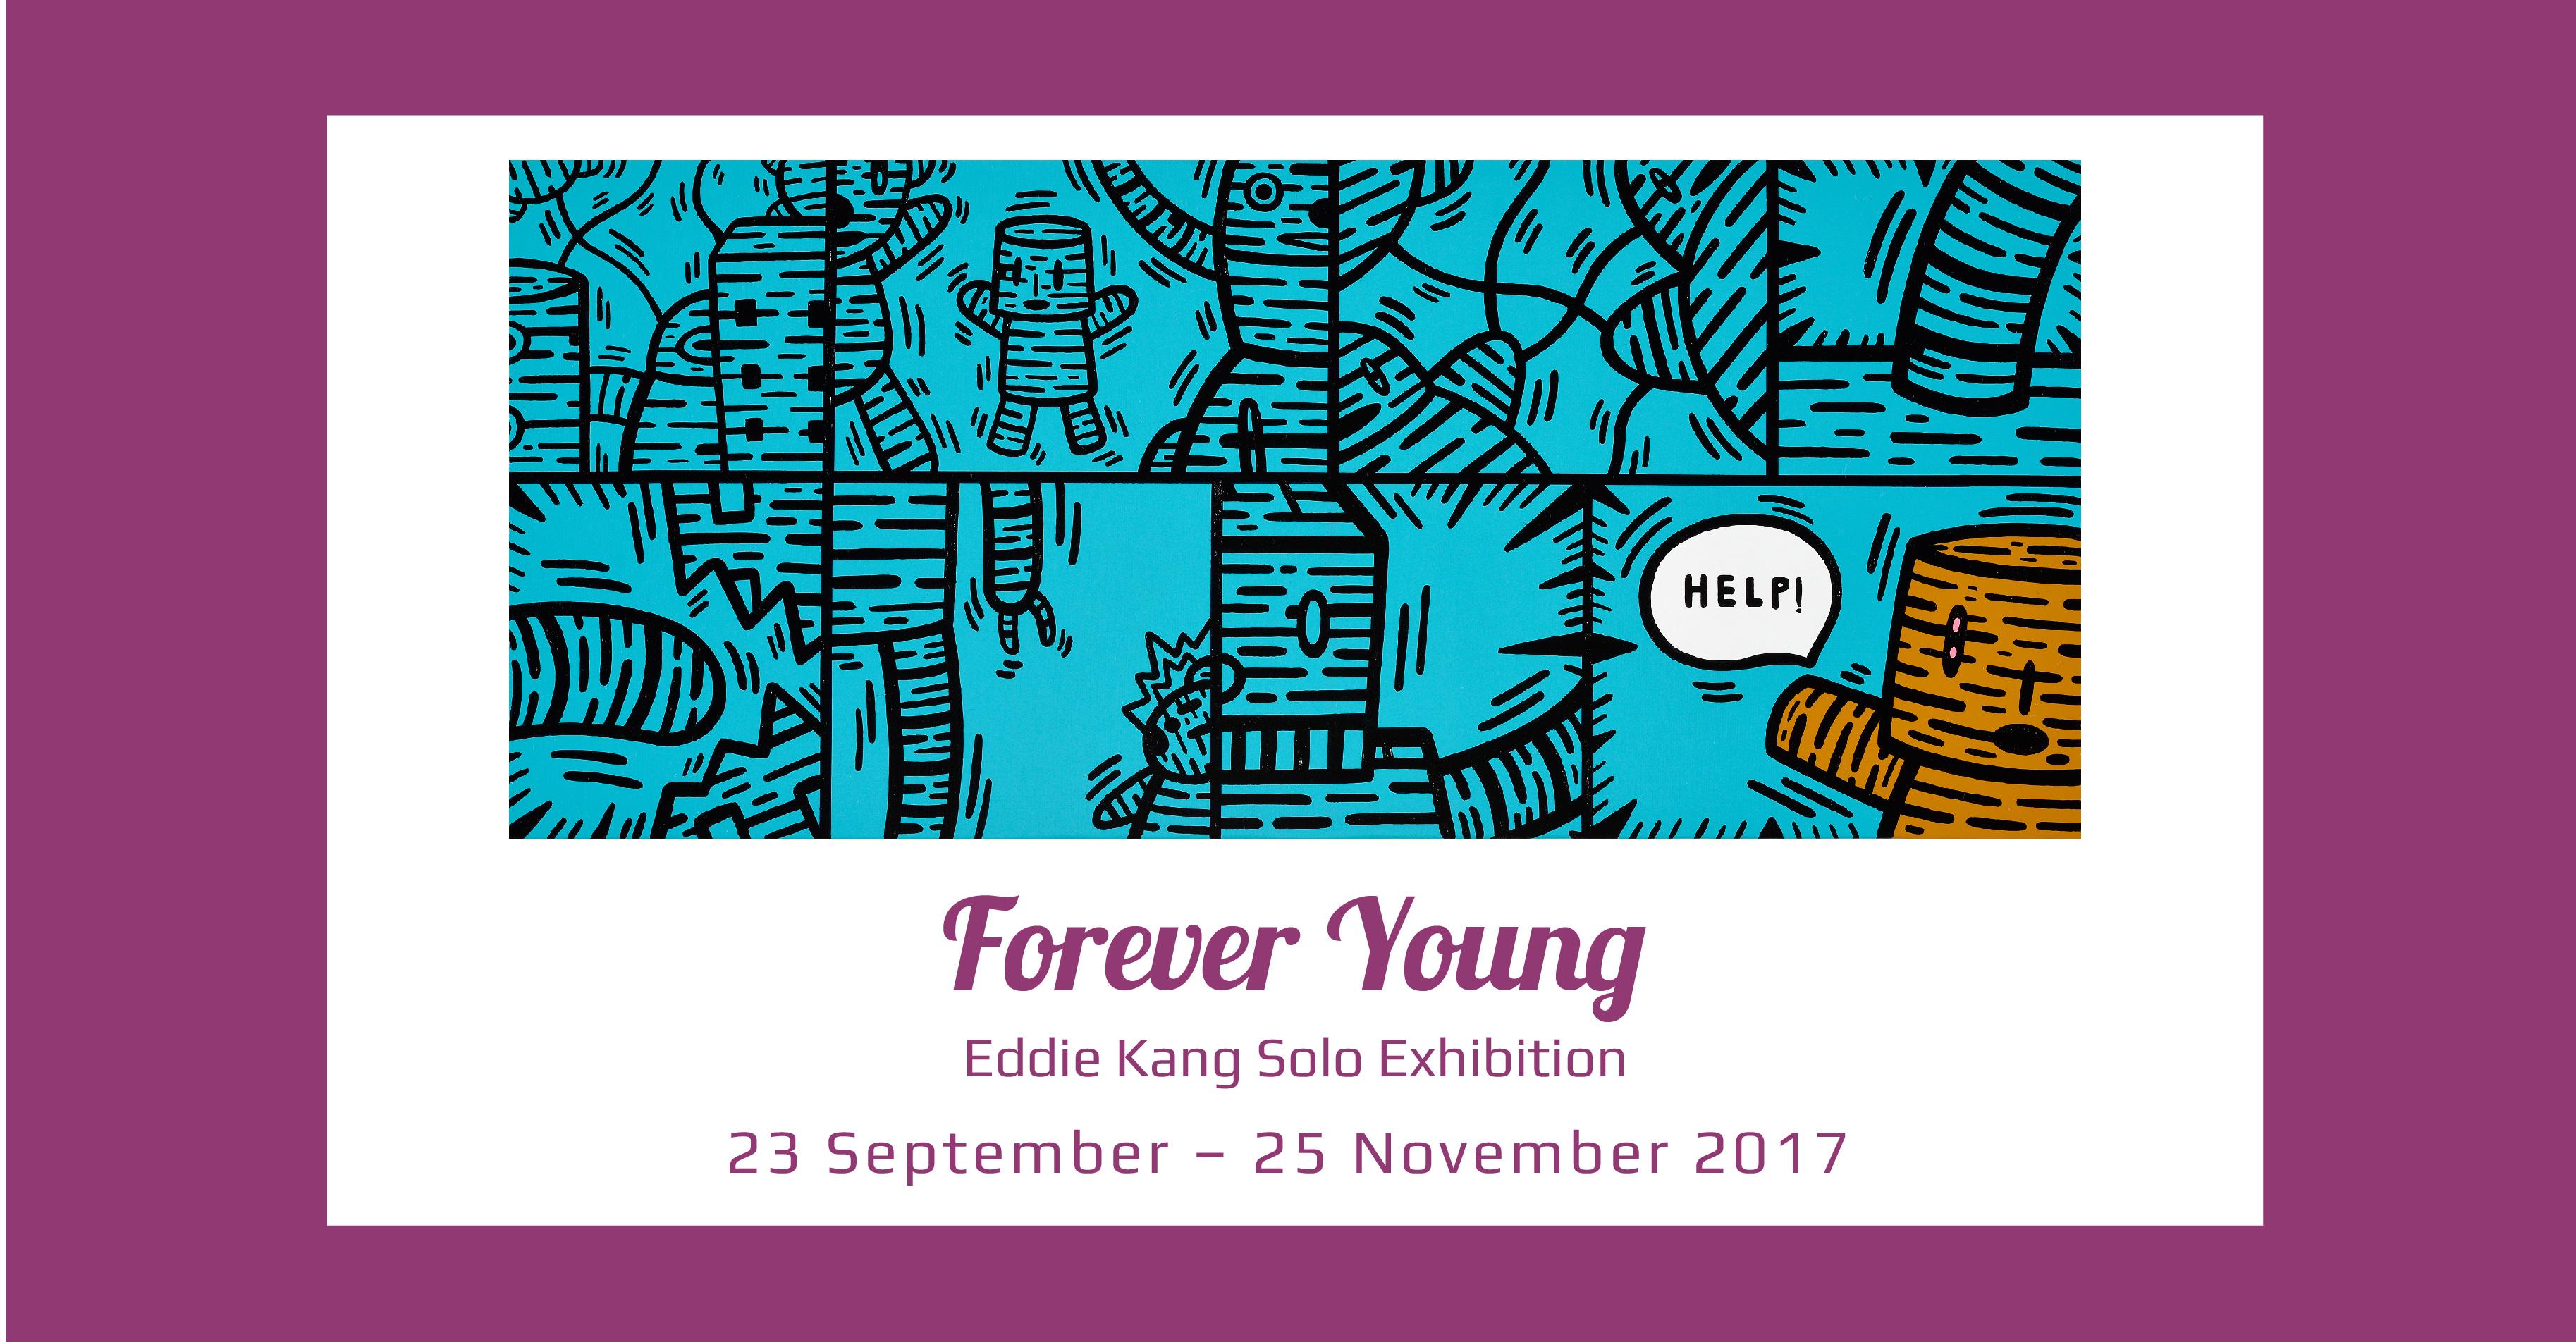 Eddie Kang Solo Exhibition